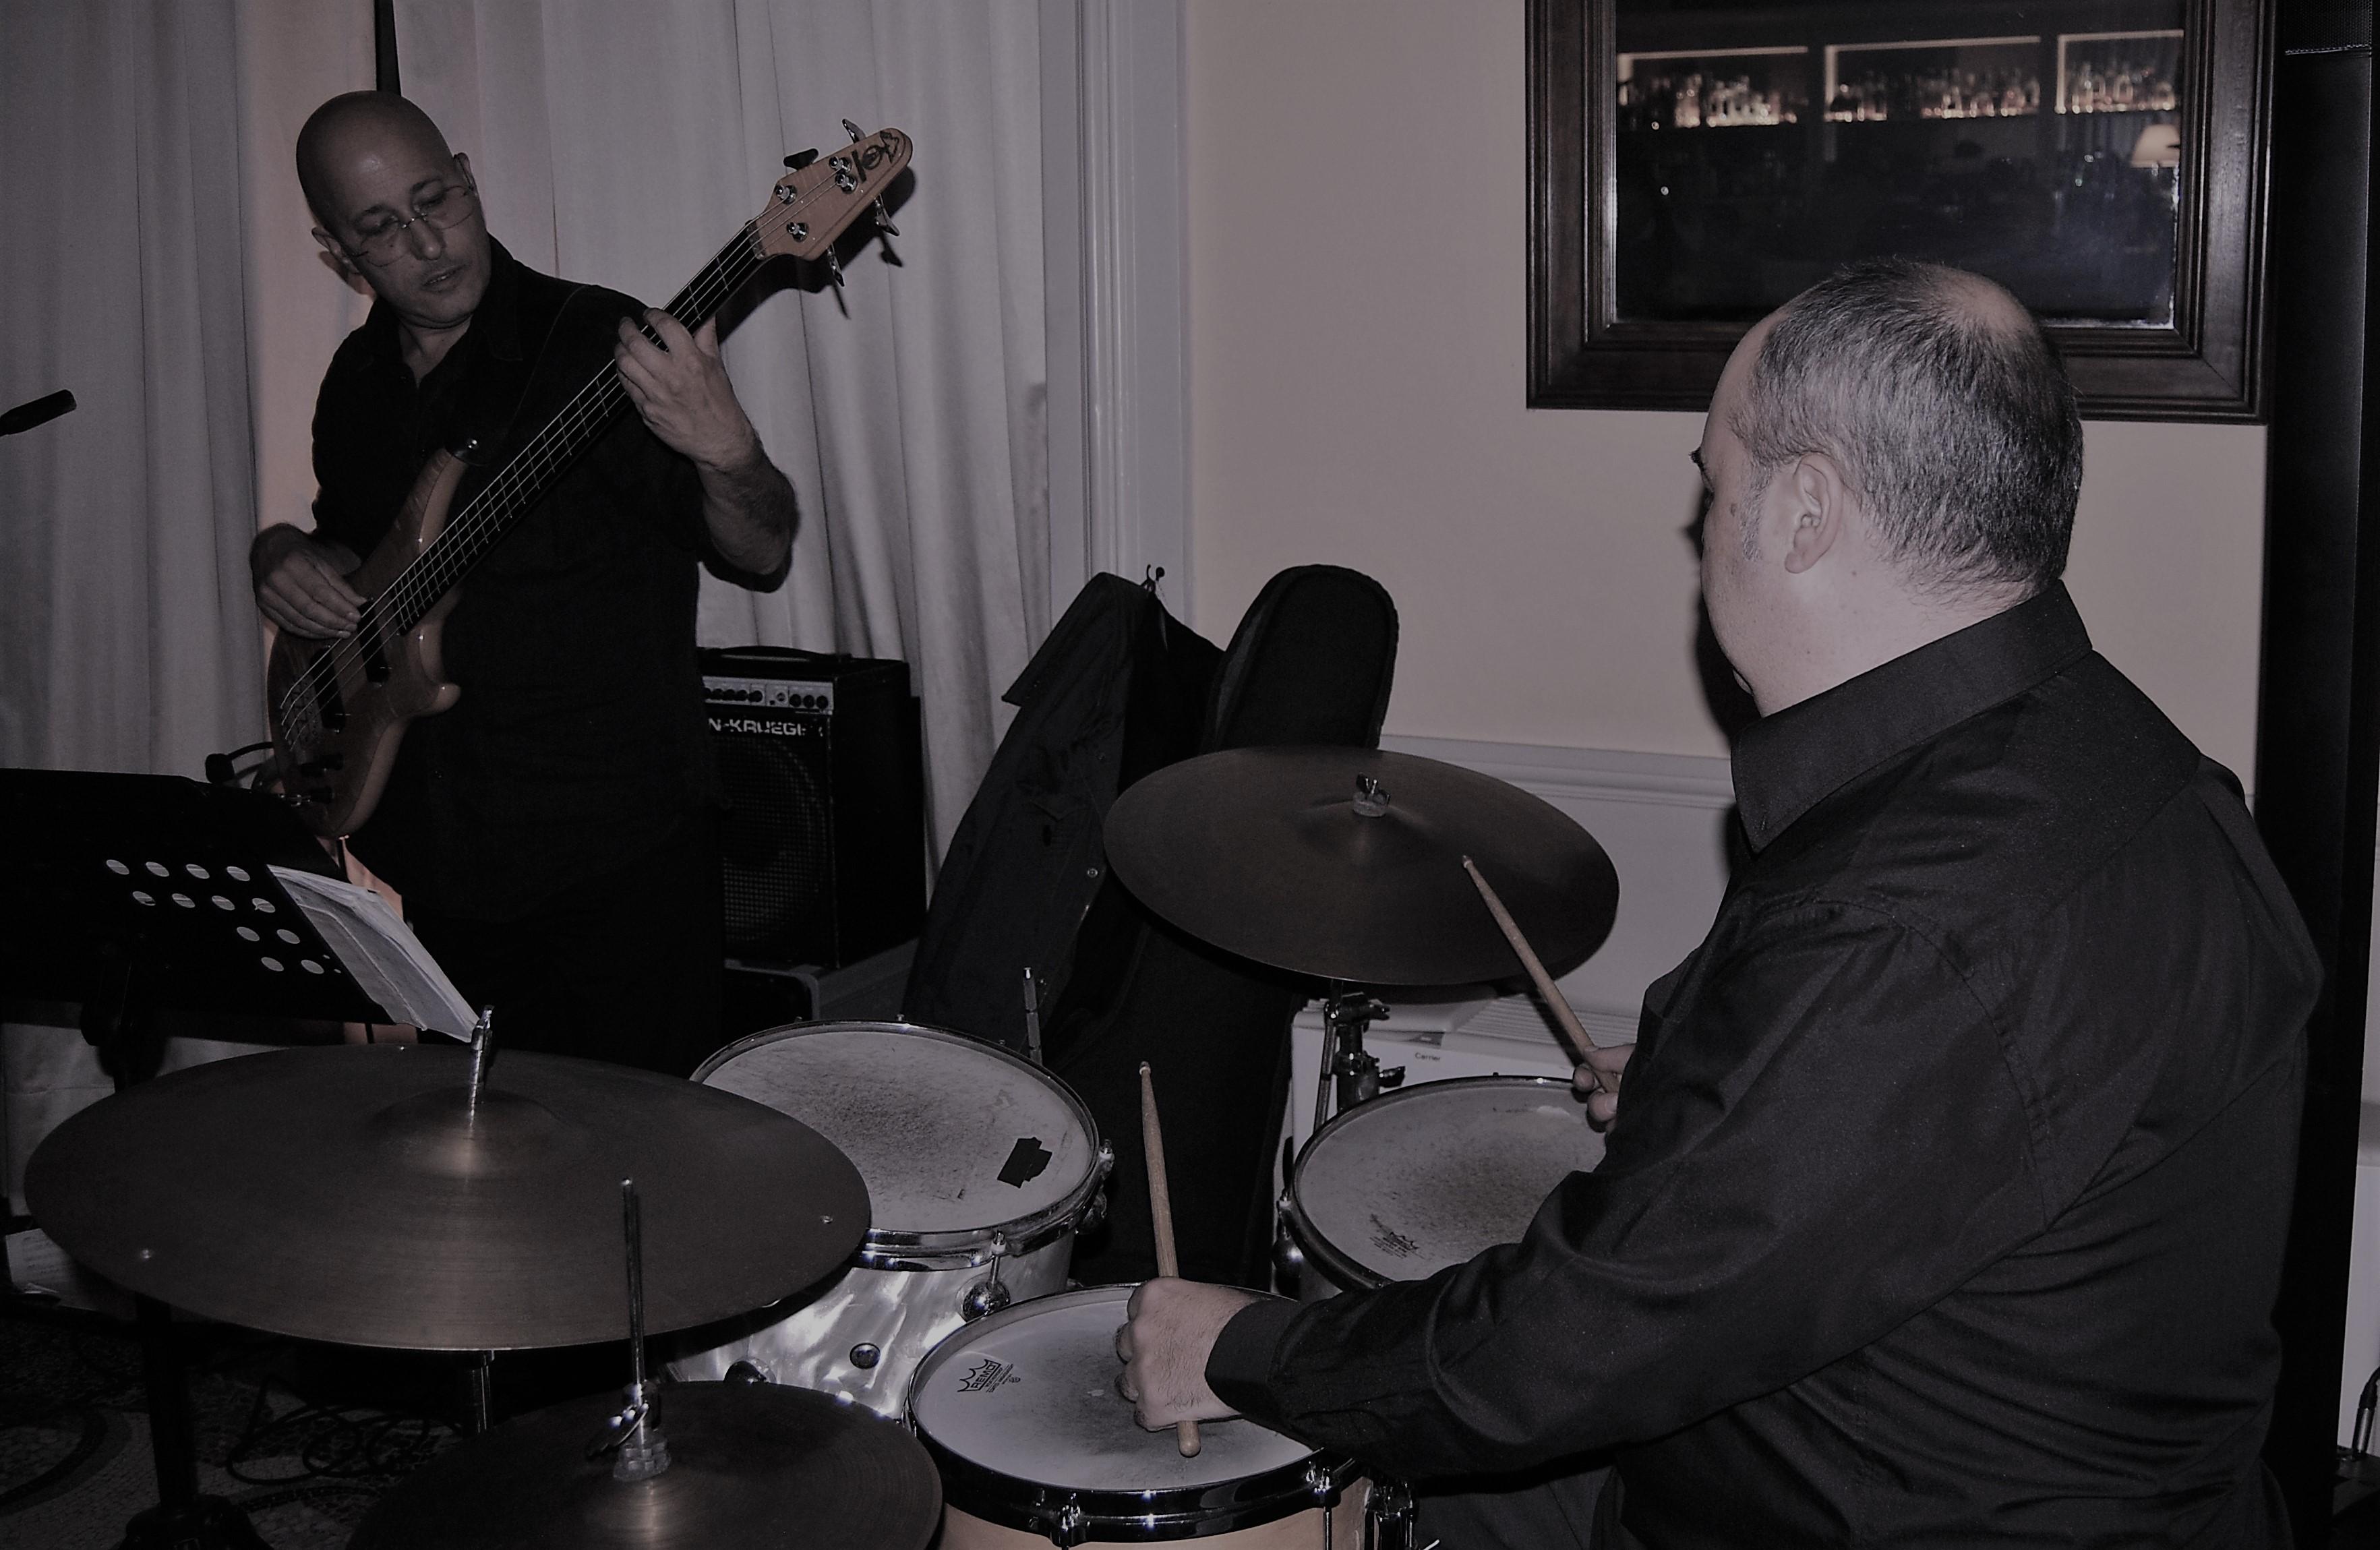 Left to Right, Nicola Pisano and Michele Piemontese at Jazz on the wather, Como Italy